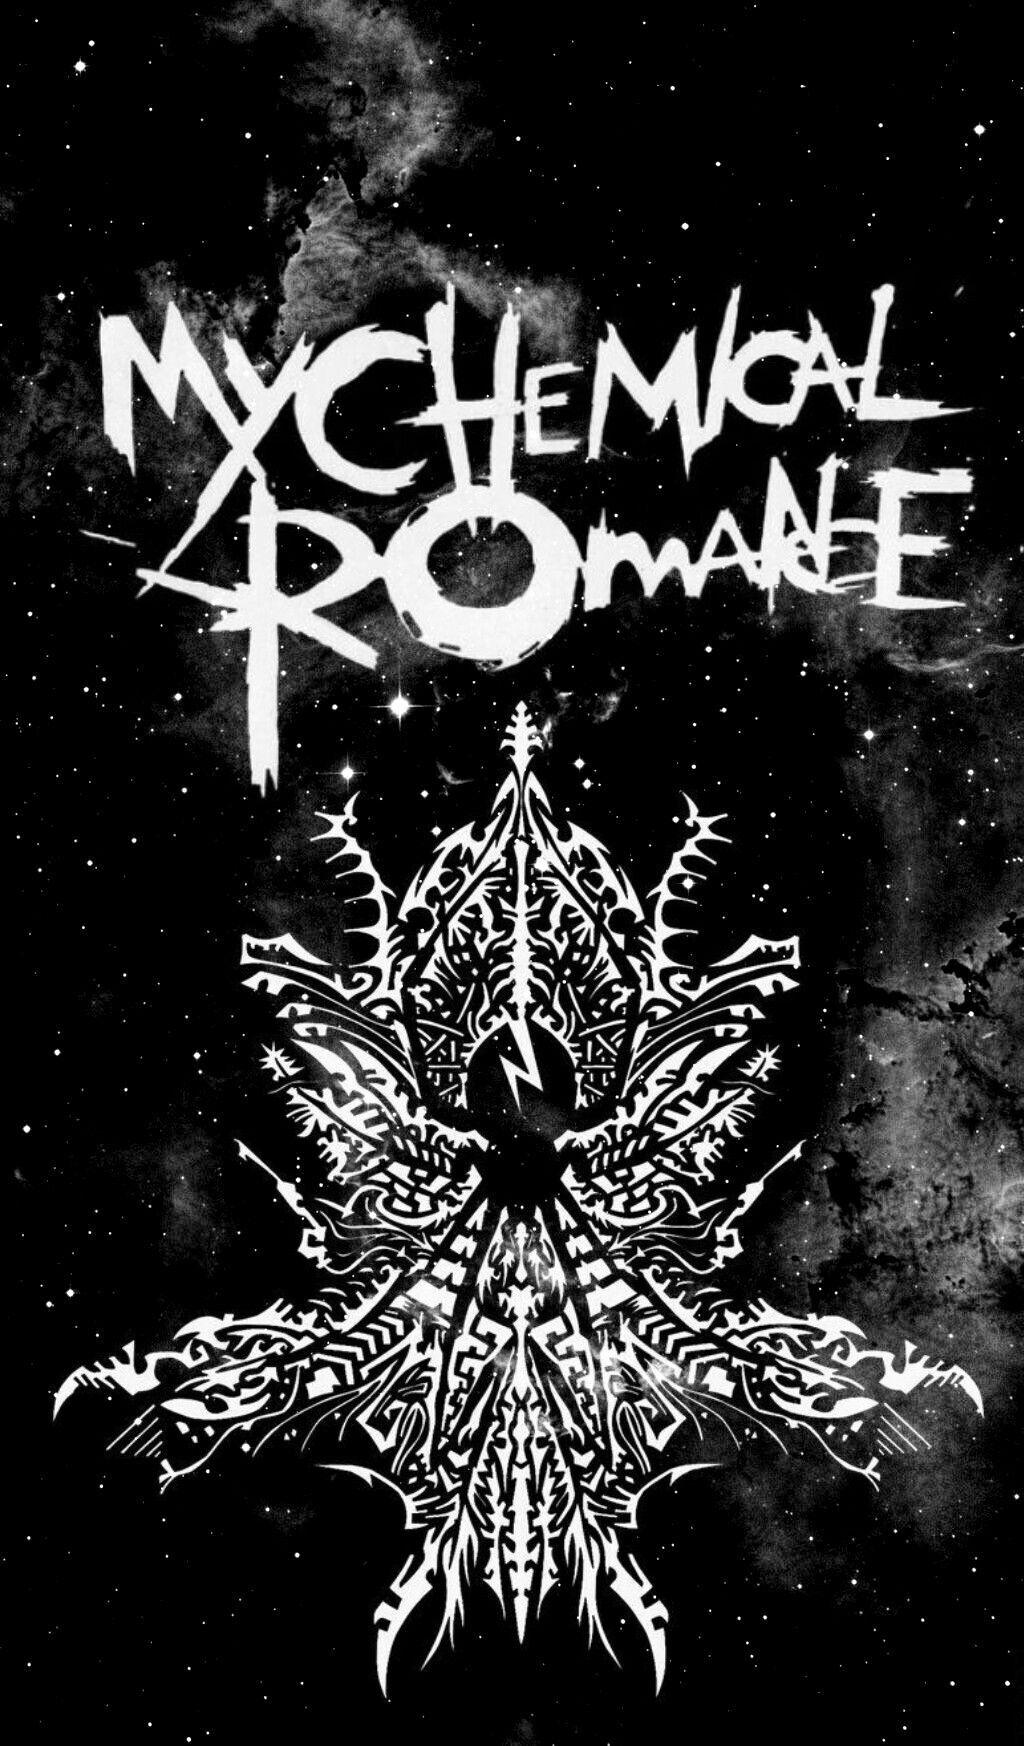 mychemicalromance fondo wallpaper Emo wallpaper, My